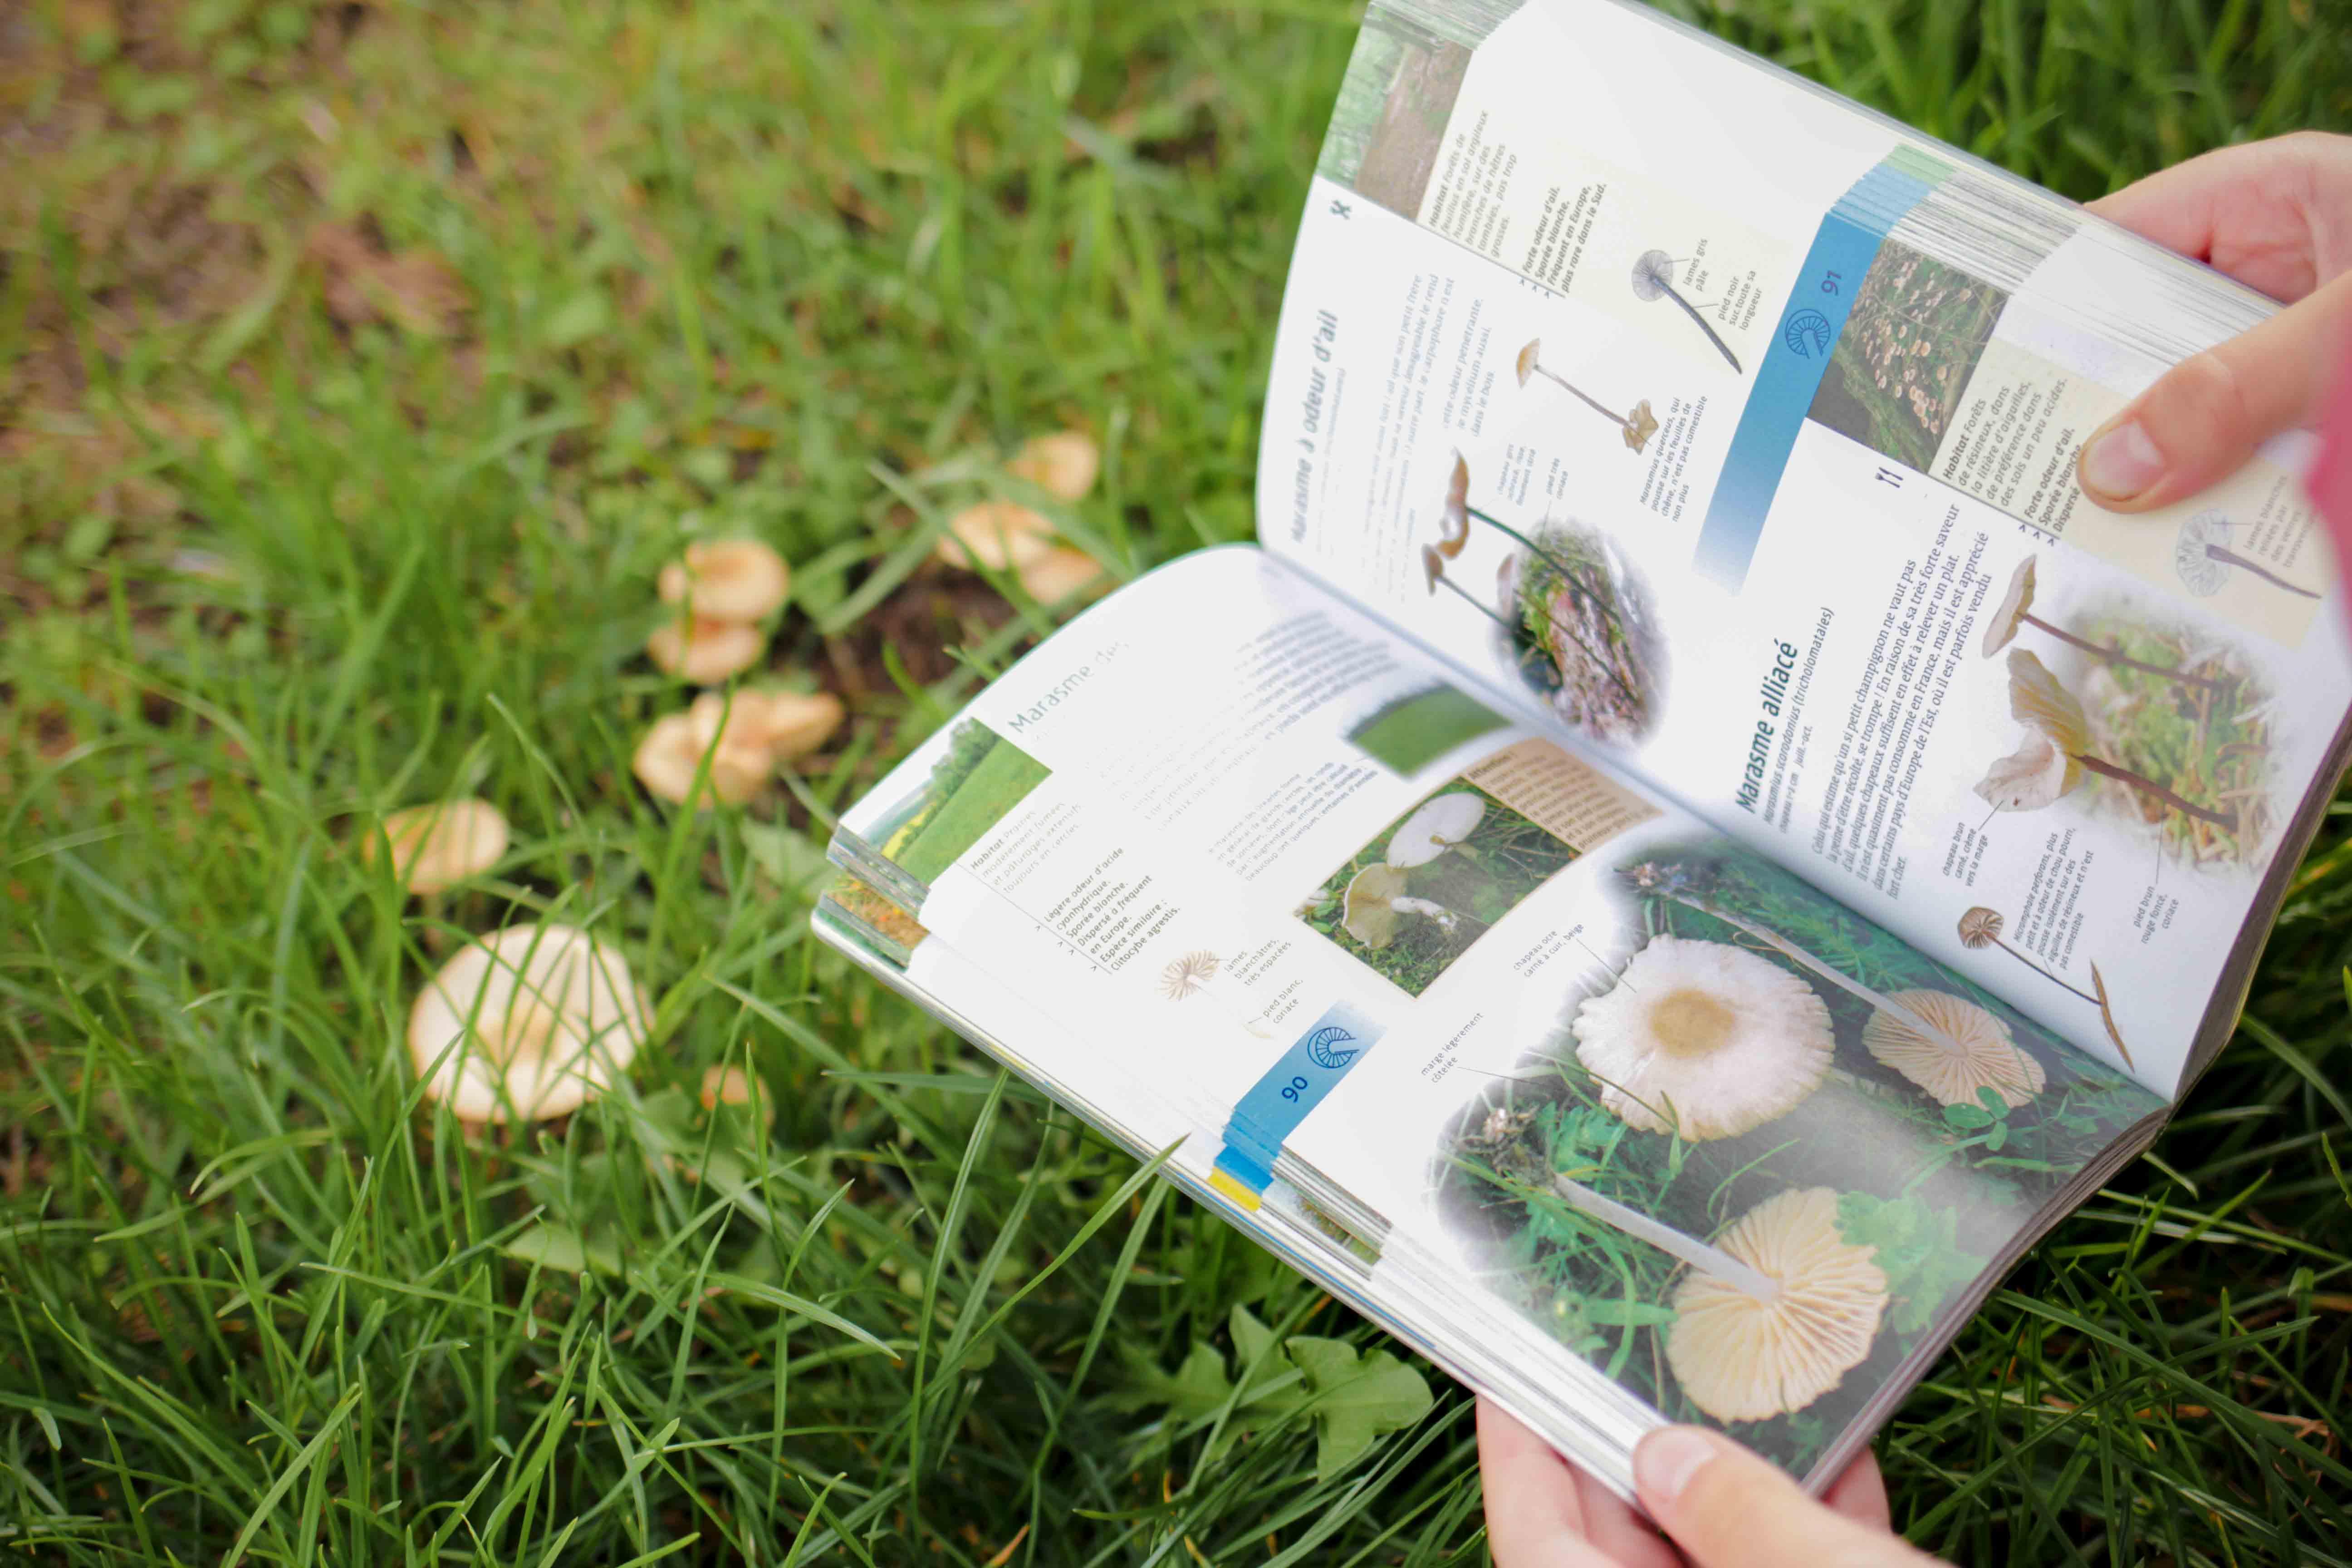 claudialeclercq-edible mushrooms-champignons comestibles_-15